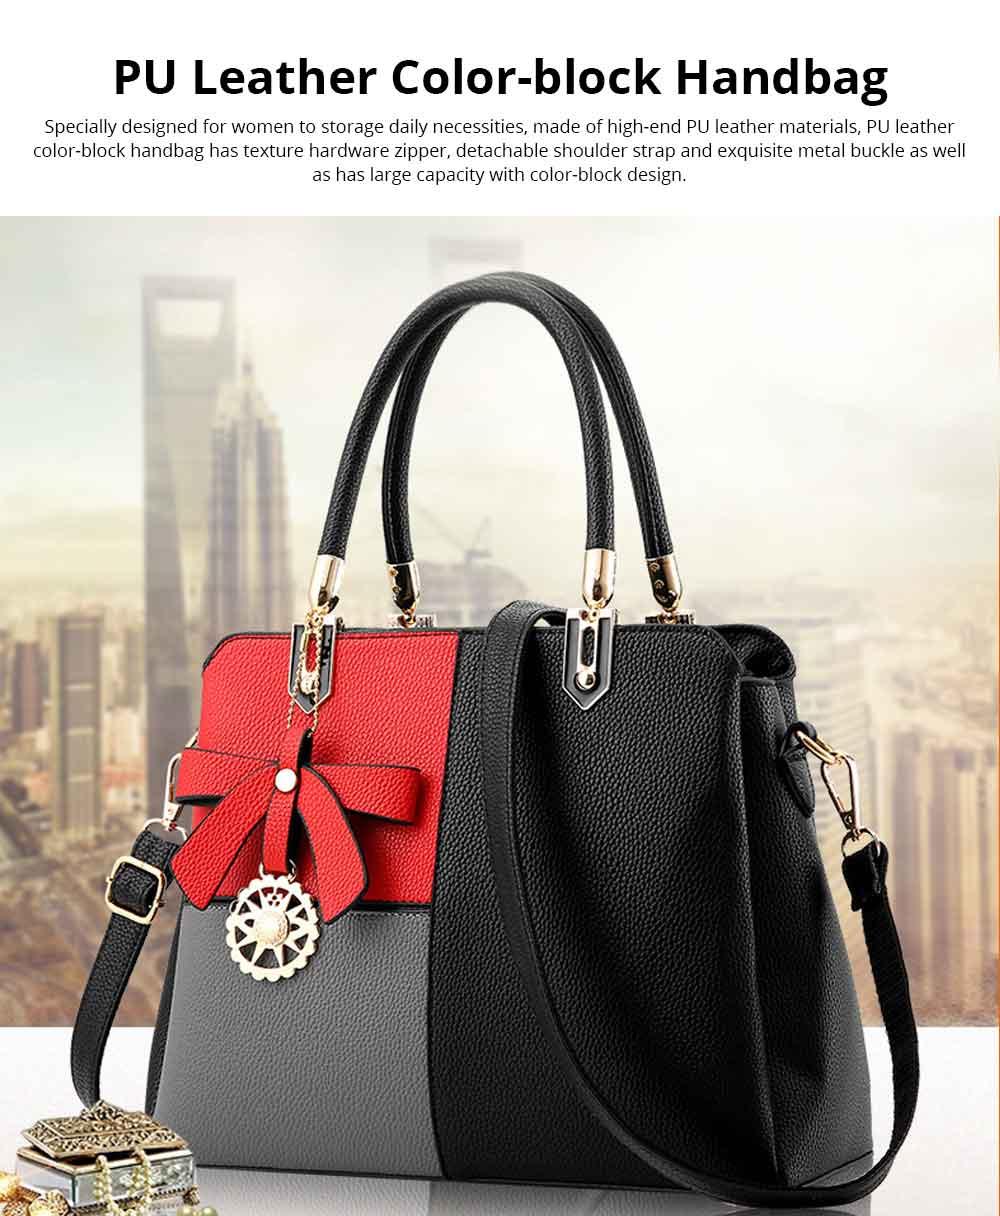 PU Leather Color-block Handbag for Ladies, Fashion Elegant Bag With Smooth Hardware Zipper, Large Capacity 0